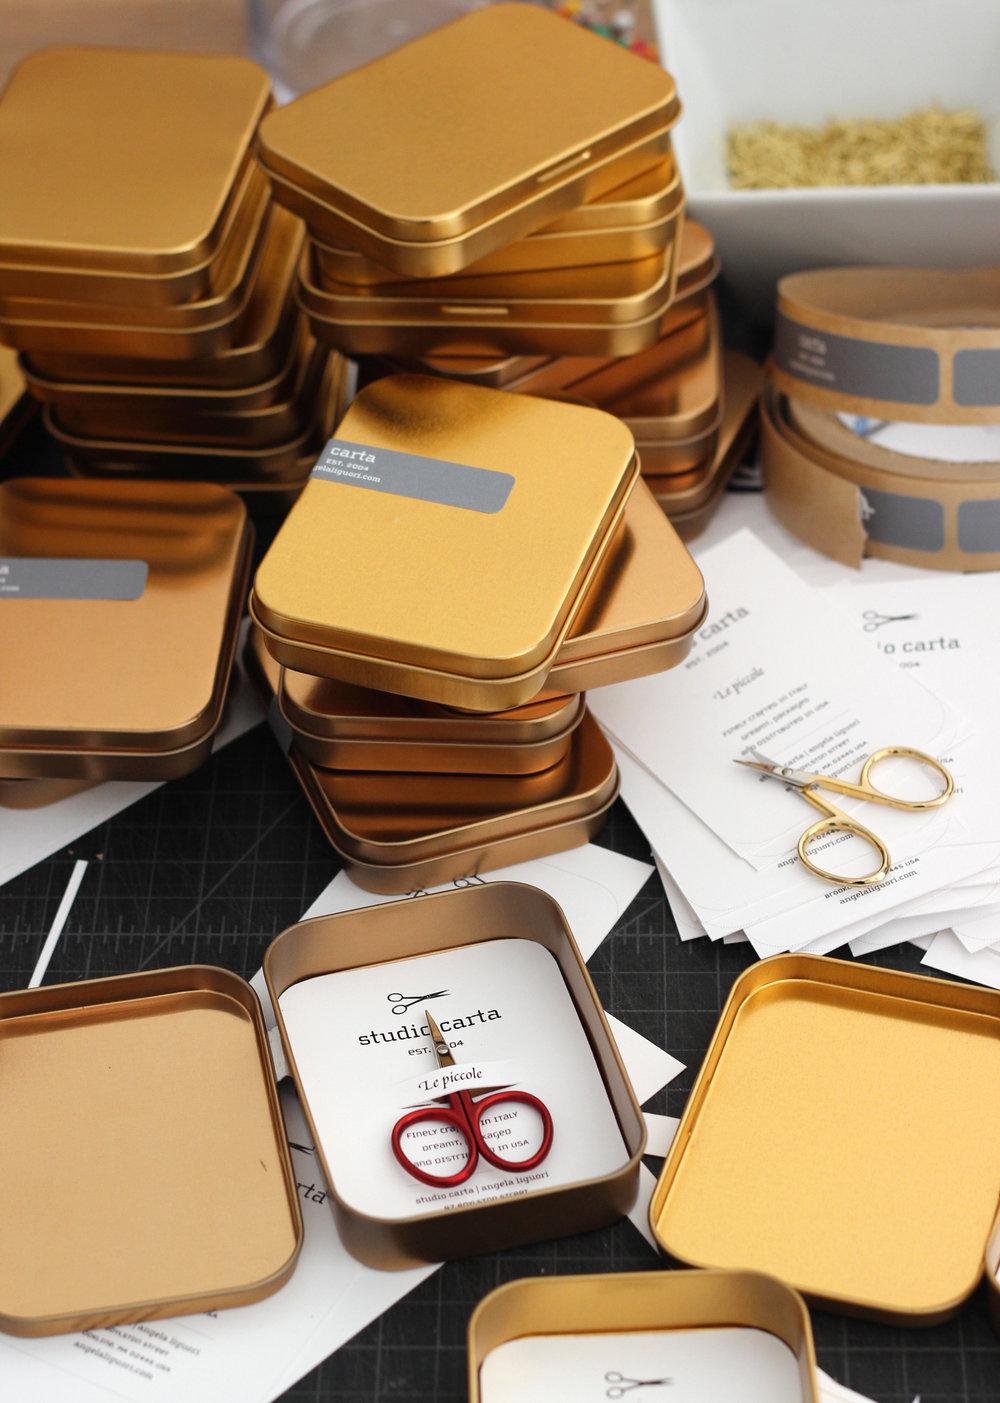 Le piccole packaging | Studio CartaW.jpg